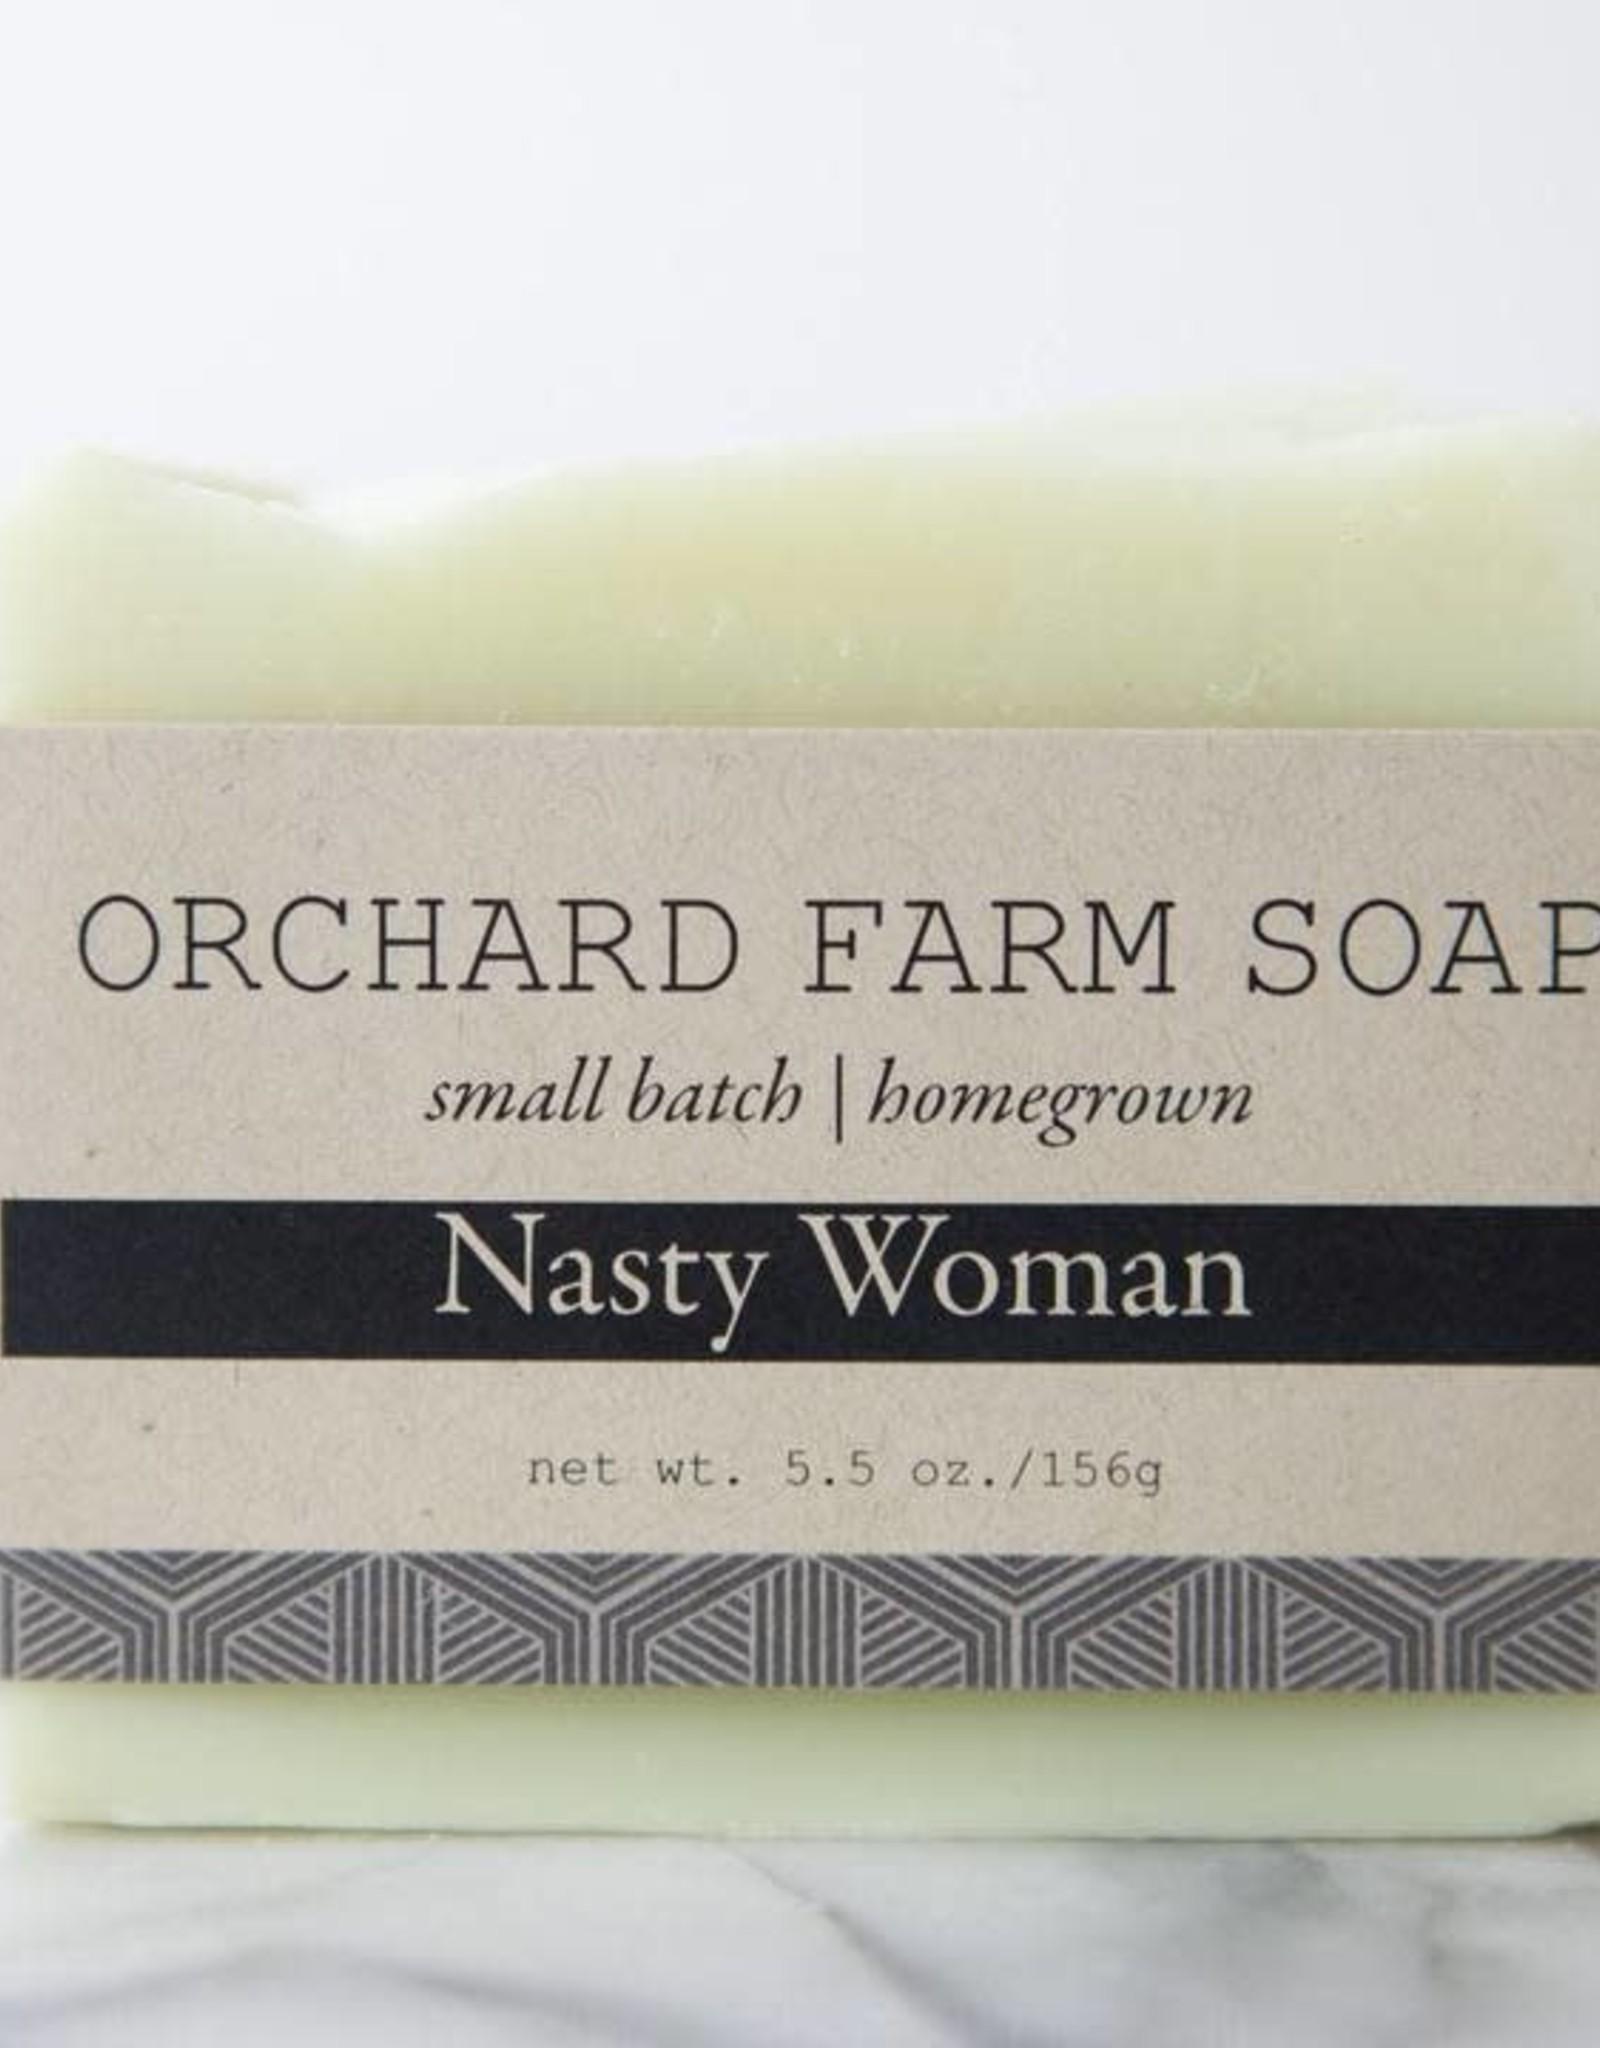 SOAP-NASTY WOMAN